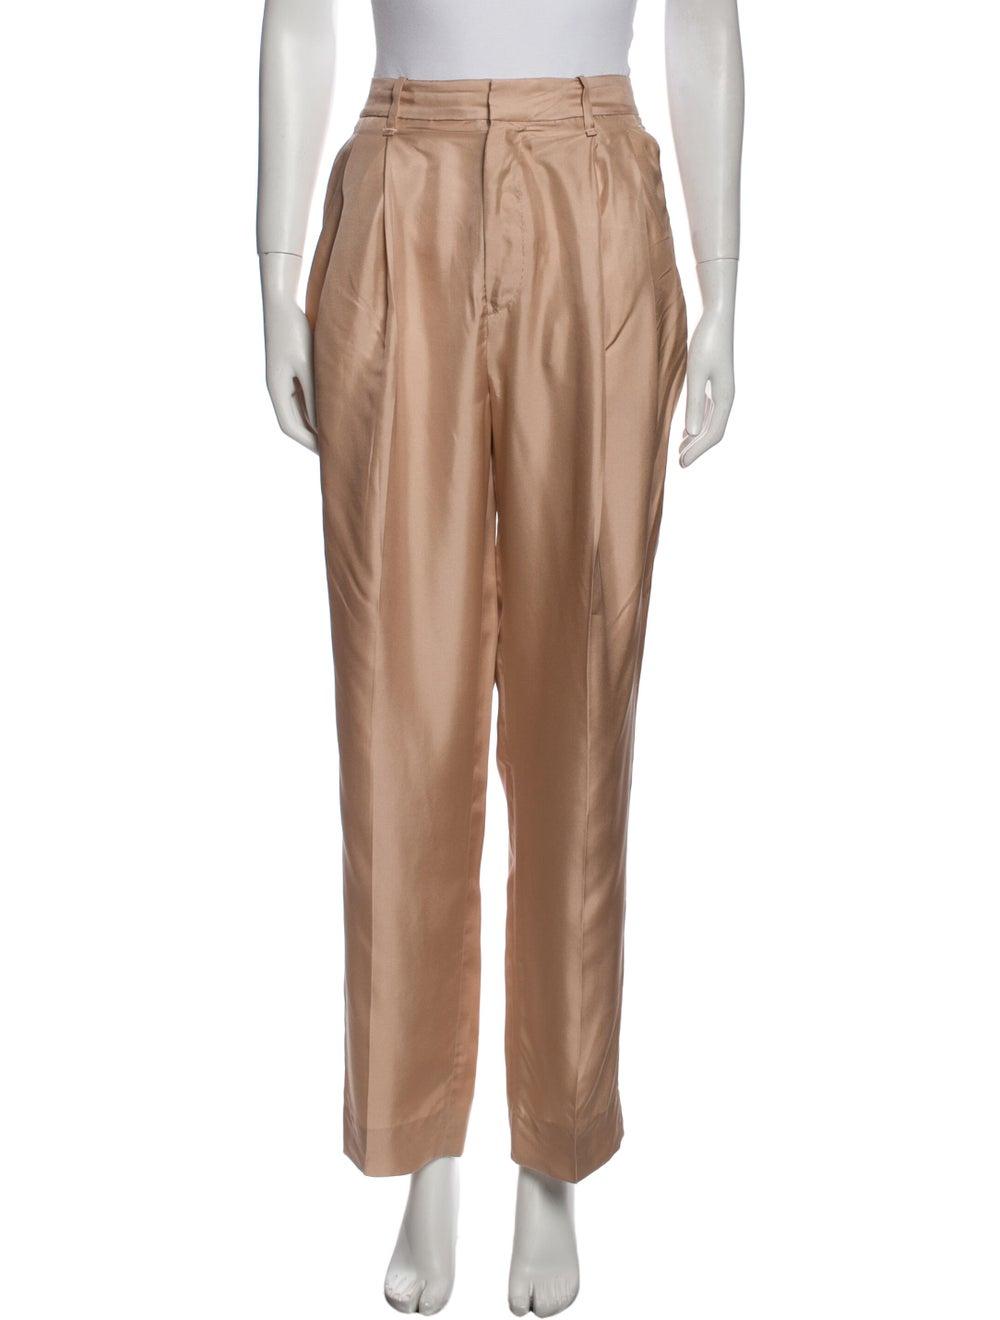 Rag & Bone Silk Straight Leg Pants - image 1